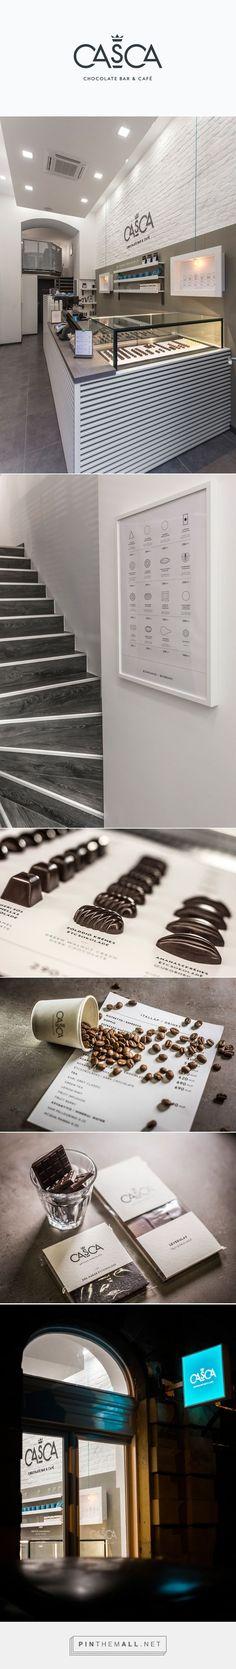 Casca Chocolate Bar and Cafe Branding on Behance | Fivestar Branding – Design and Branding Agency & Inspiration Gallery